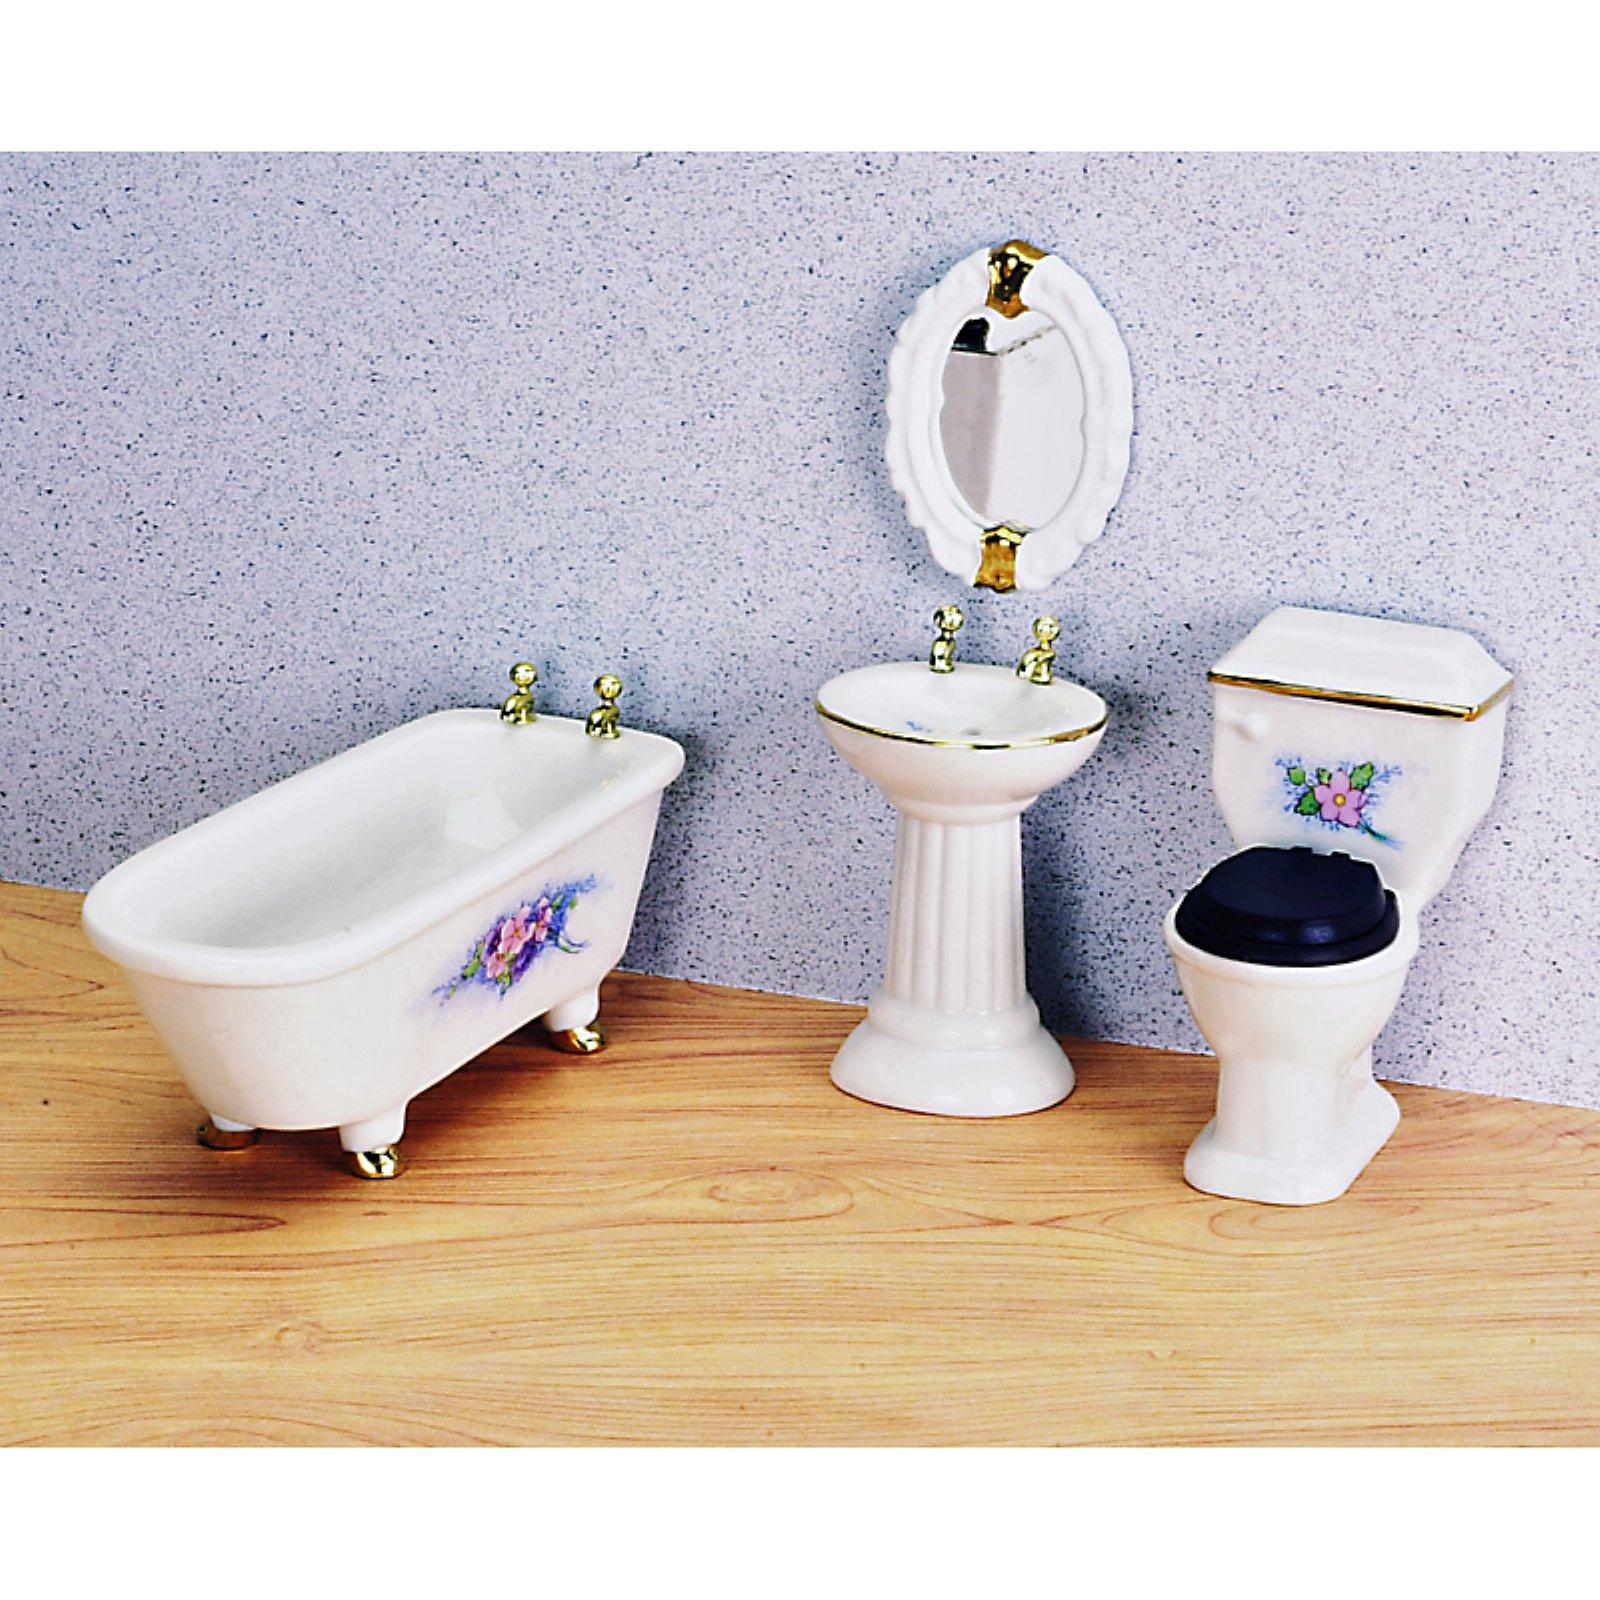 Modern Porcelain Bathroom Dollhouse Miniature Set